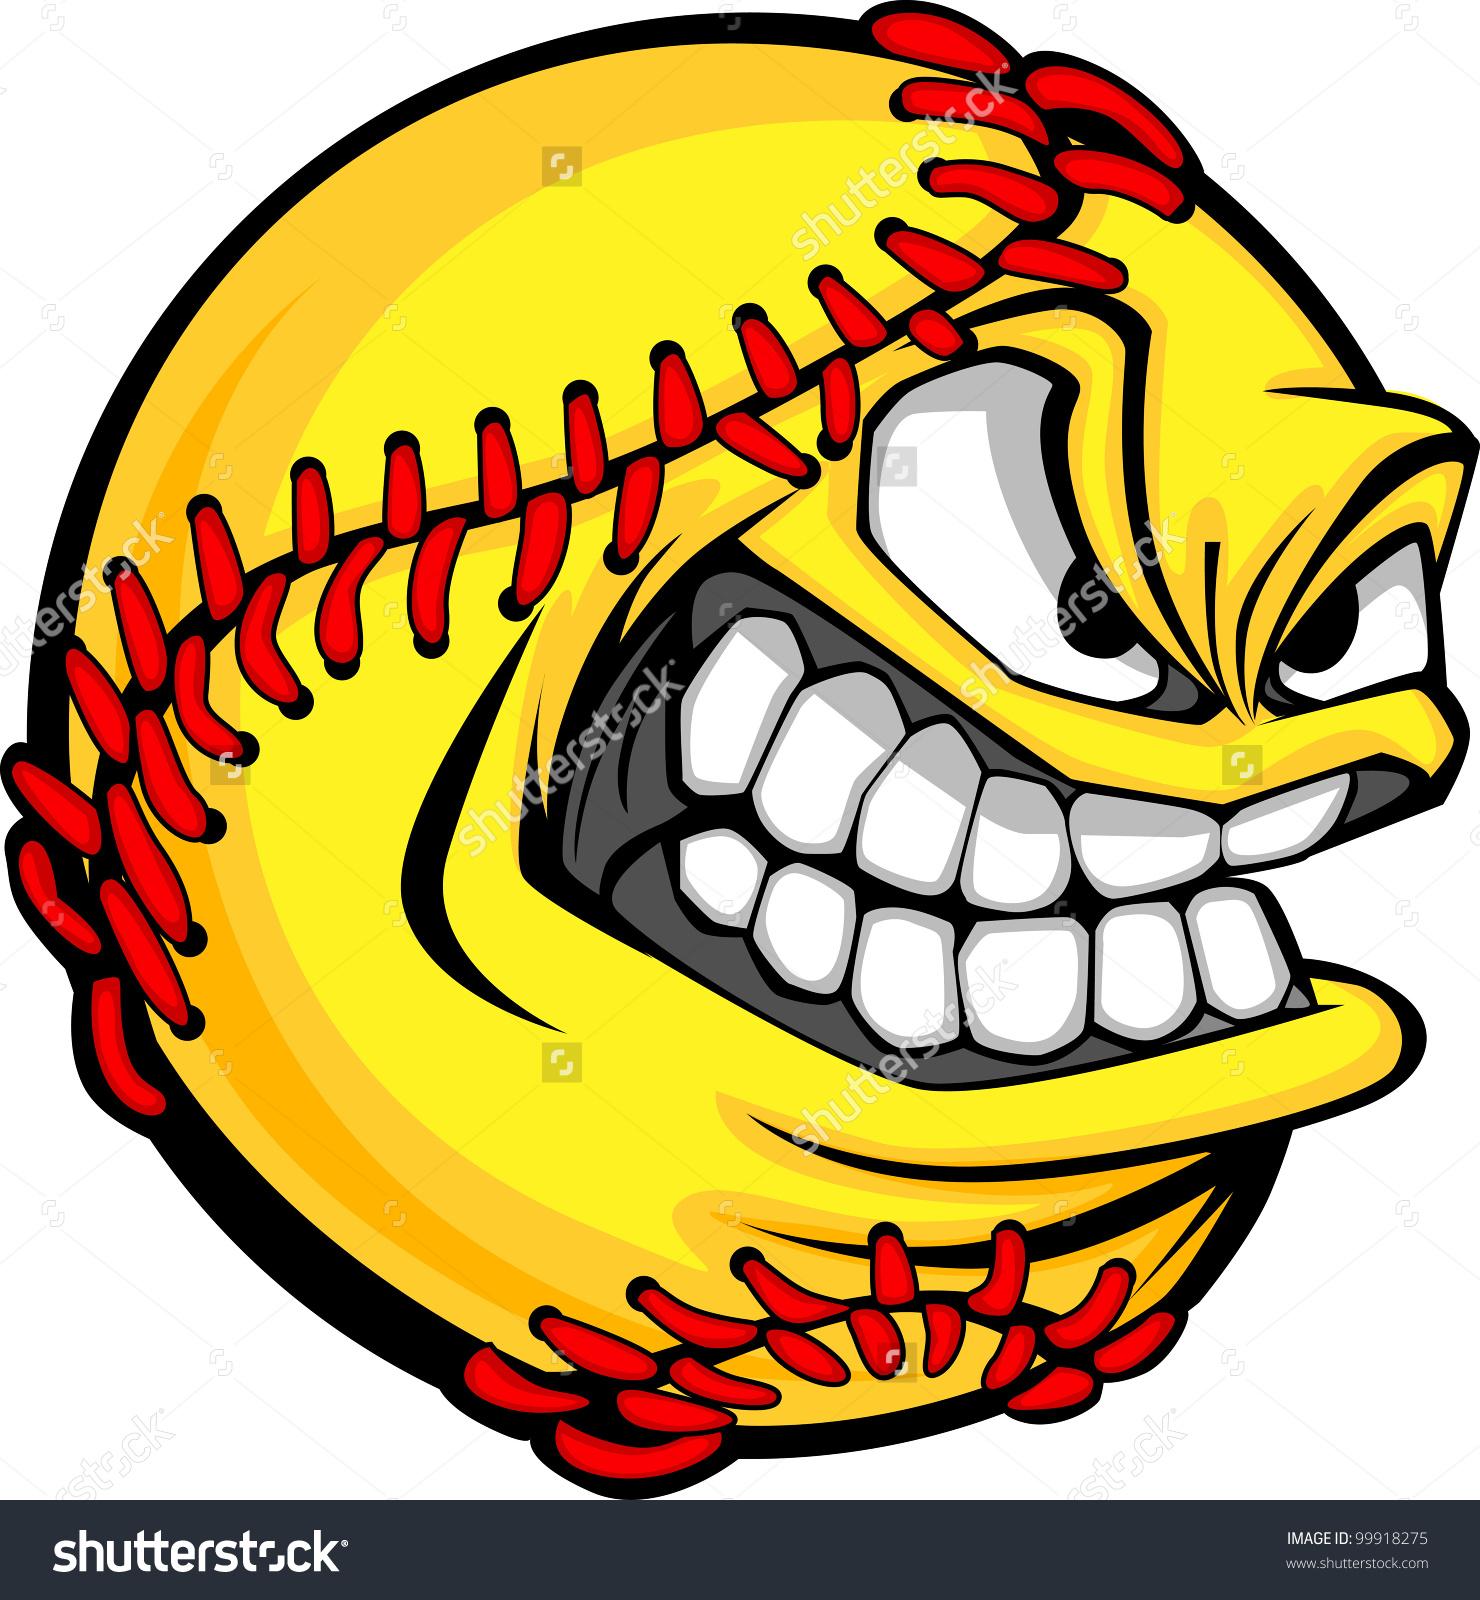 12 Mean Face Vector Images - Cartoon Basketball with Face ... | 1480 x 1600 jpeg 666kB